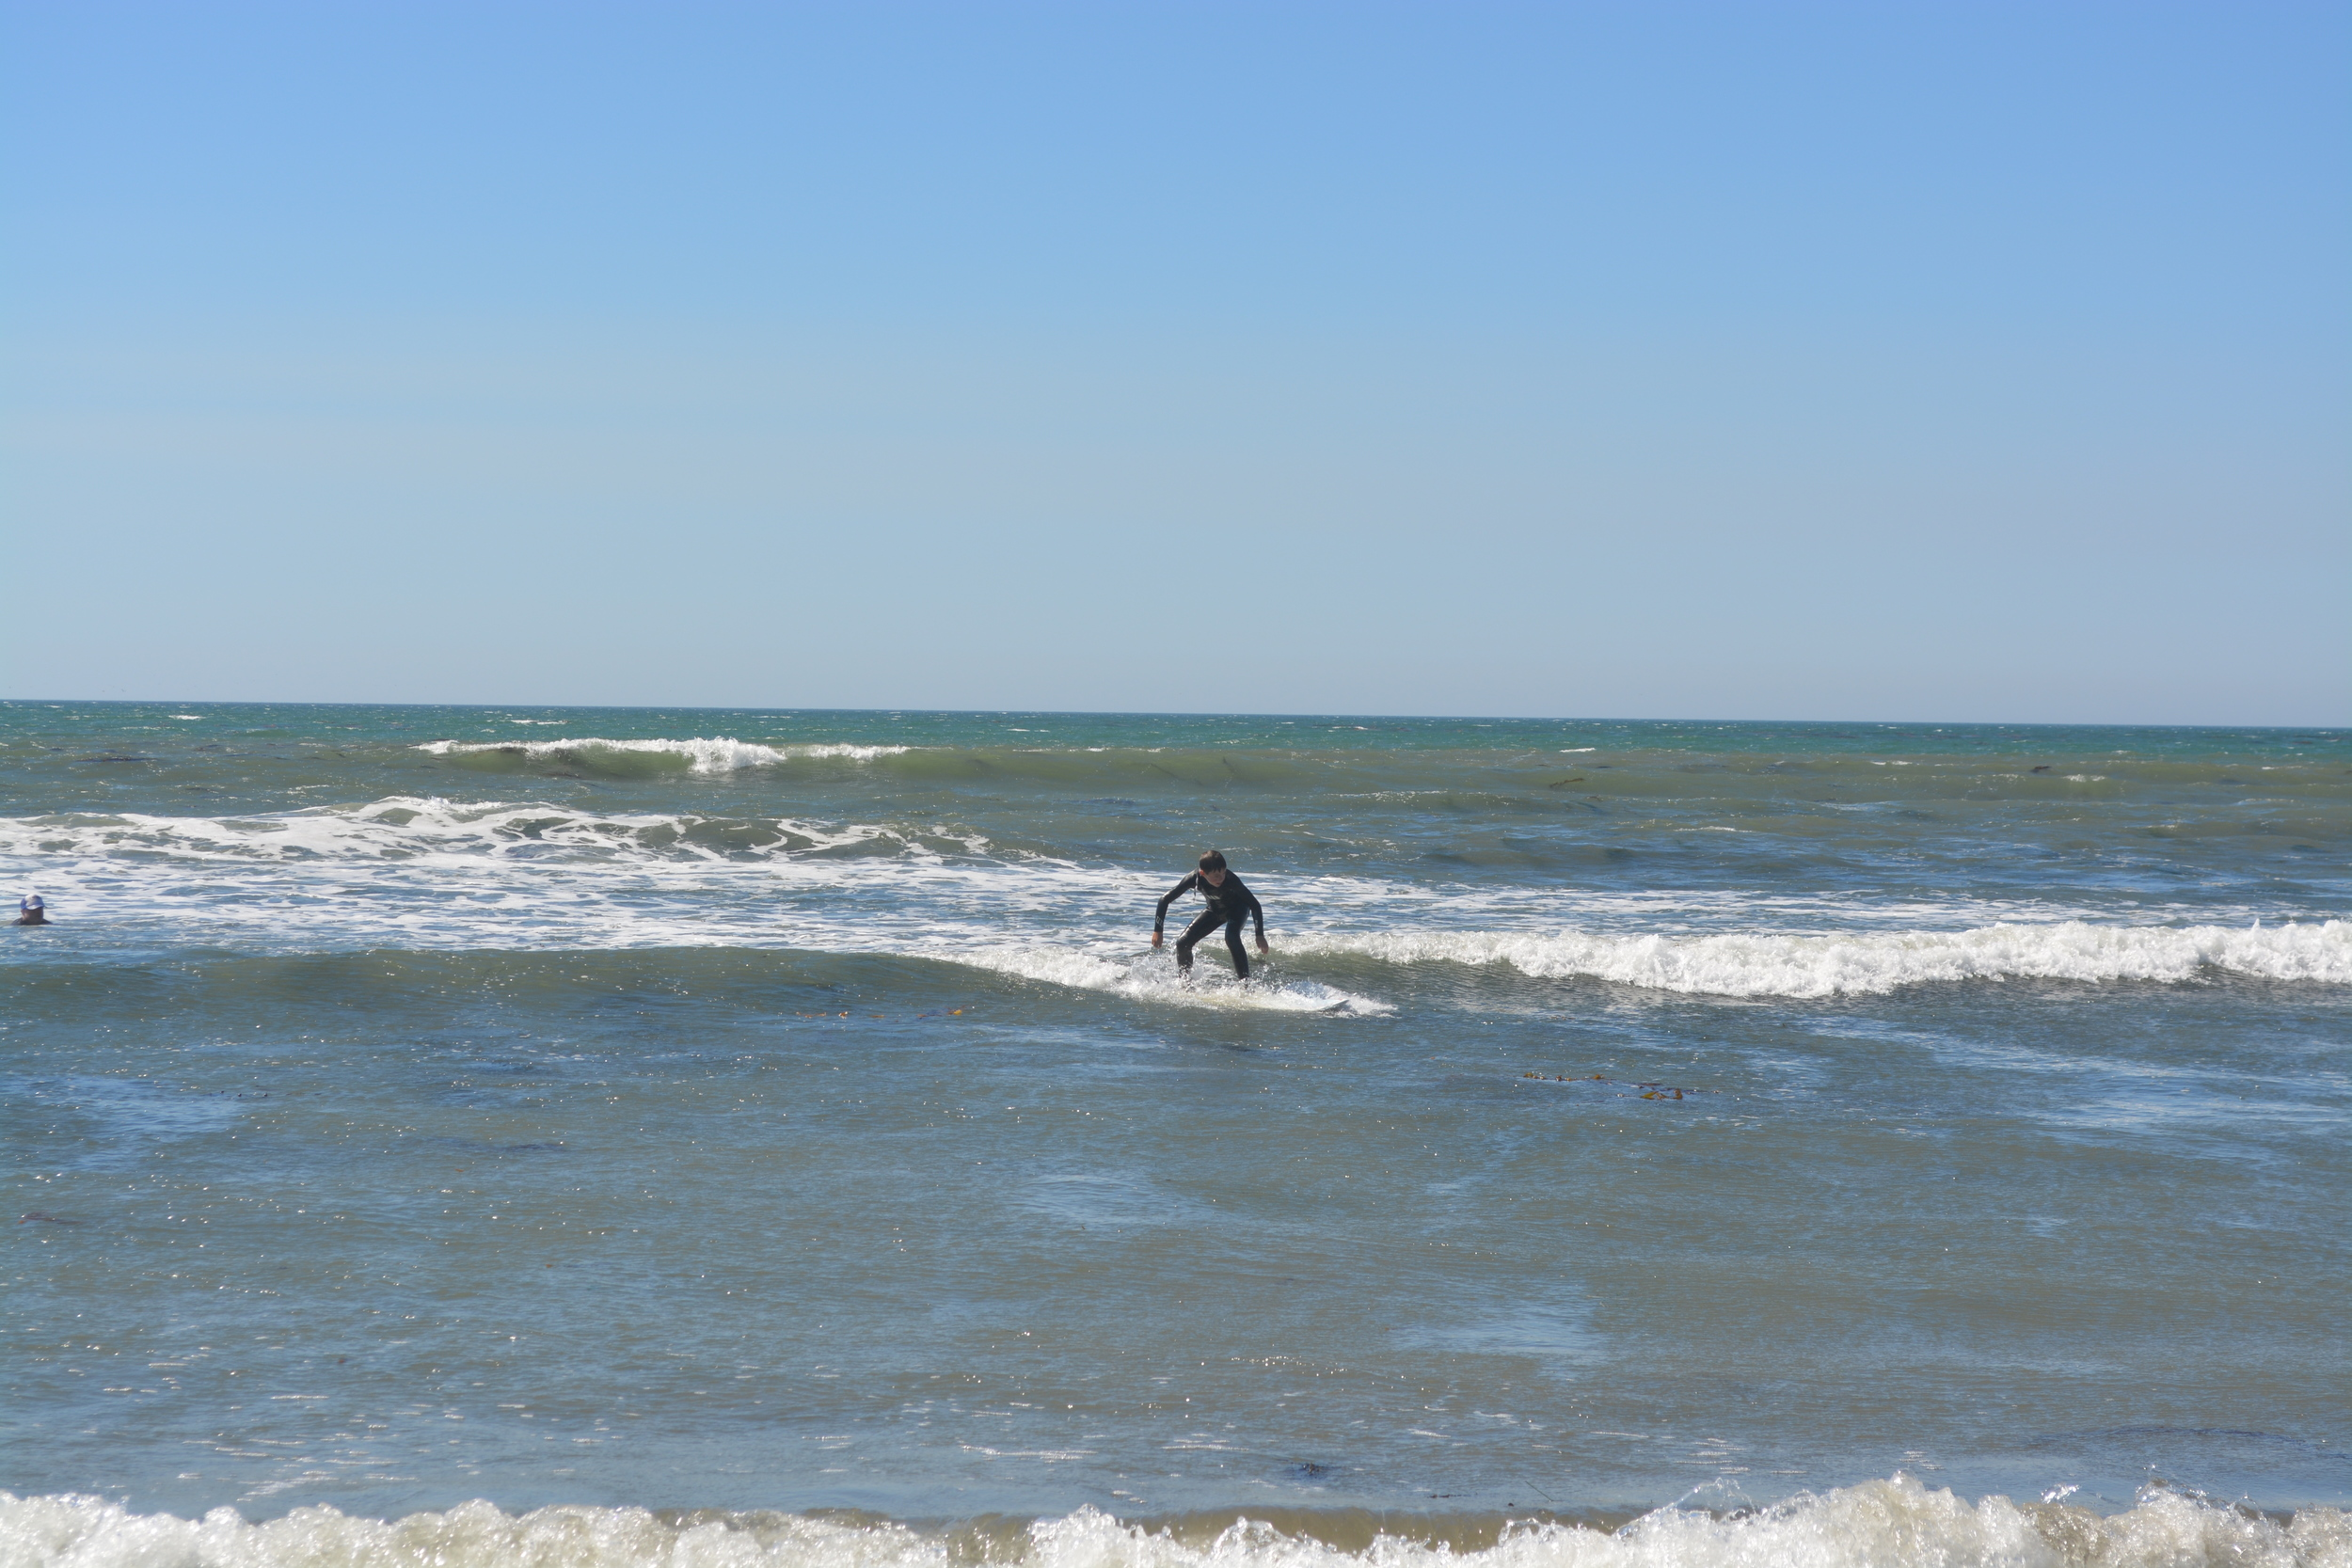 Baja California 10-5-13 Shipwrecks Surfing Adventure Ocean Experience Surf School San Diego (11).JPG